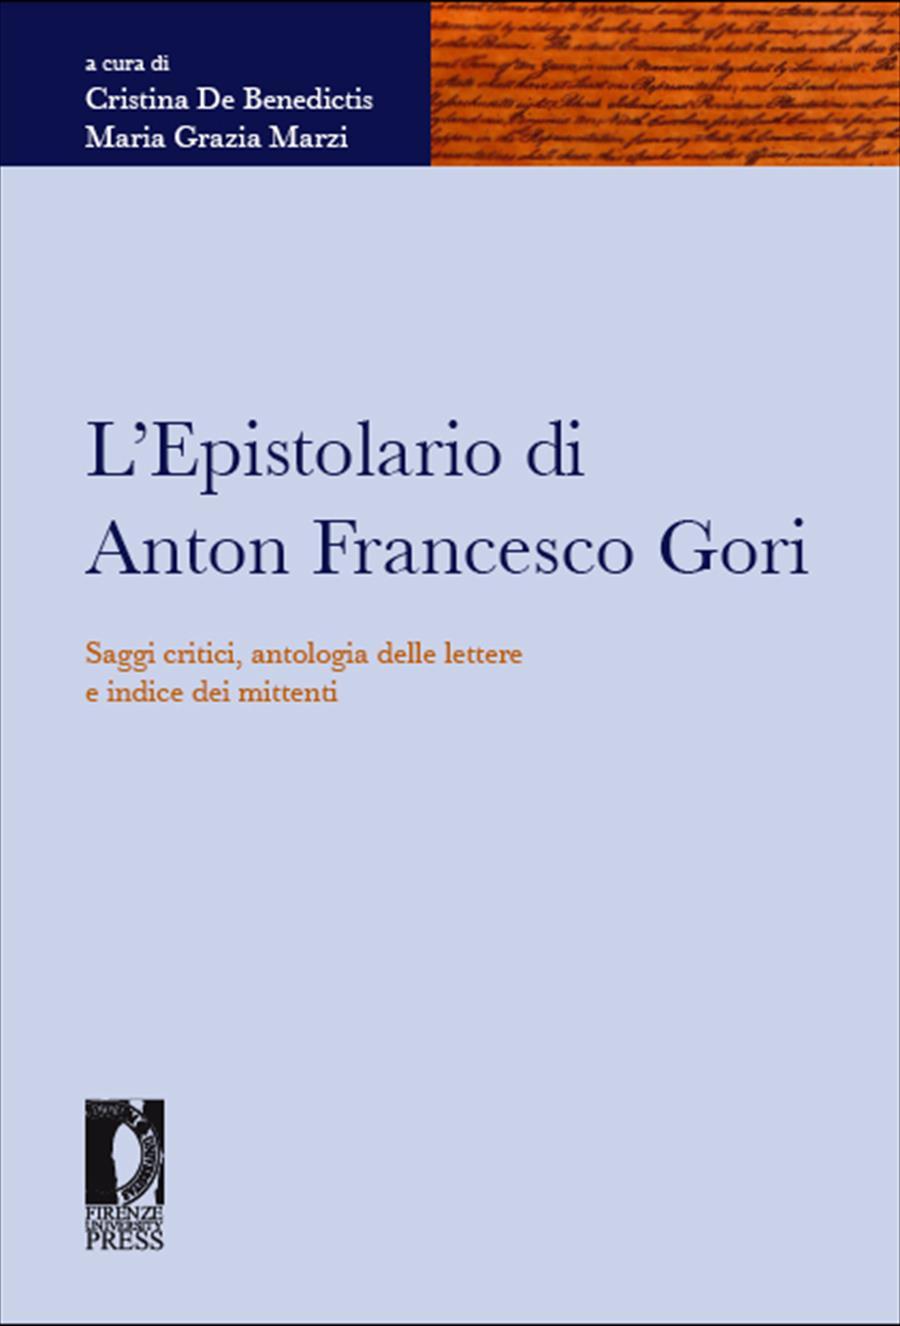 L'Epistolario di Anton Francesco Gori